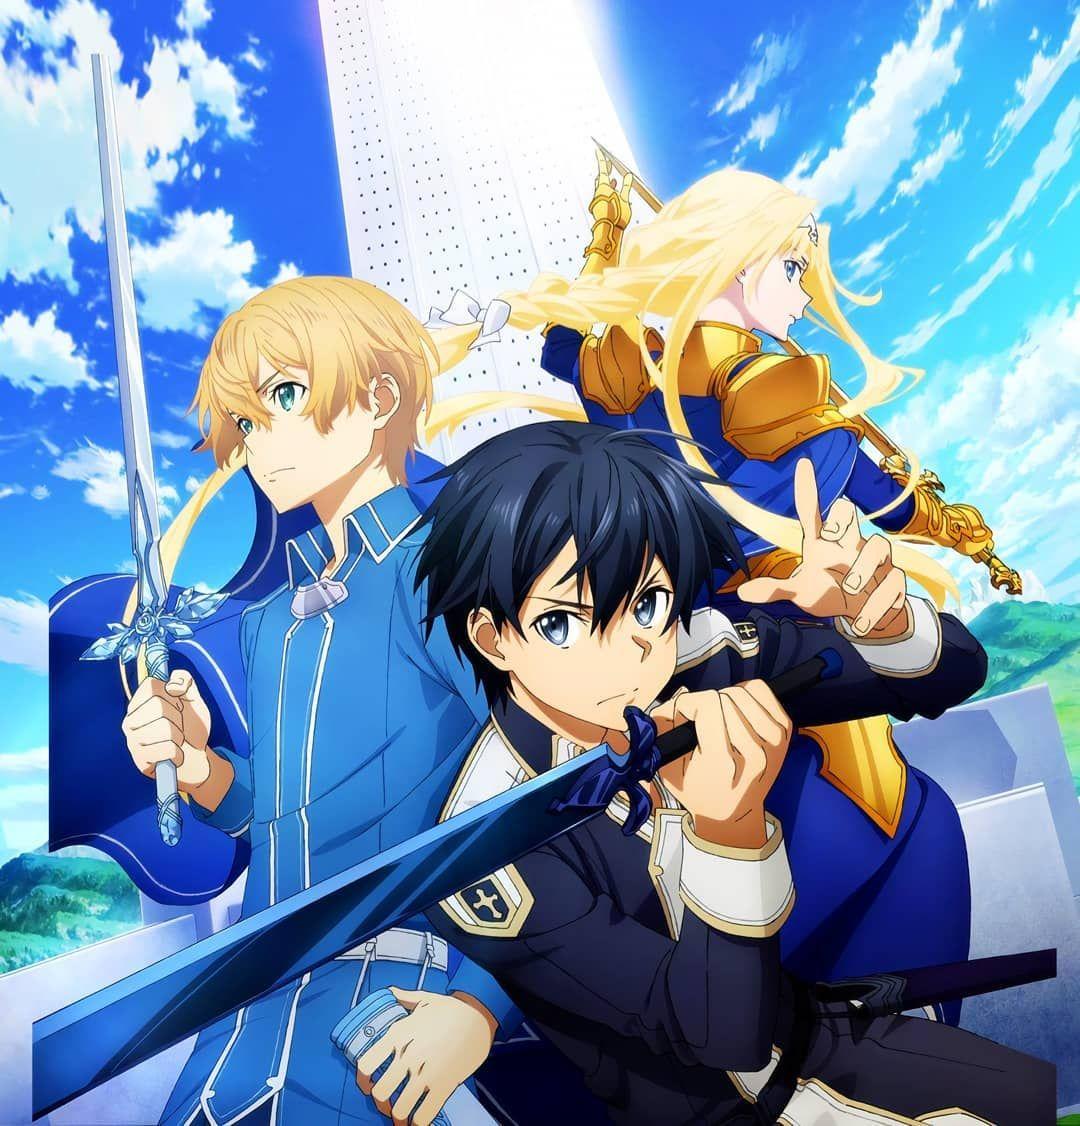 Sword Art Onlin Manga Anime ソードアートオンライン ユージオ